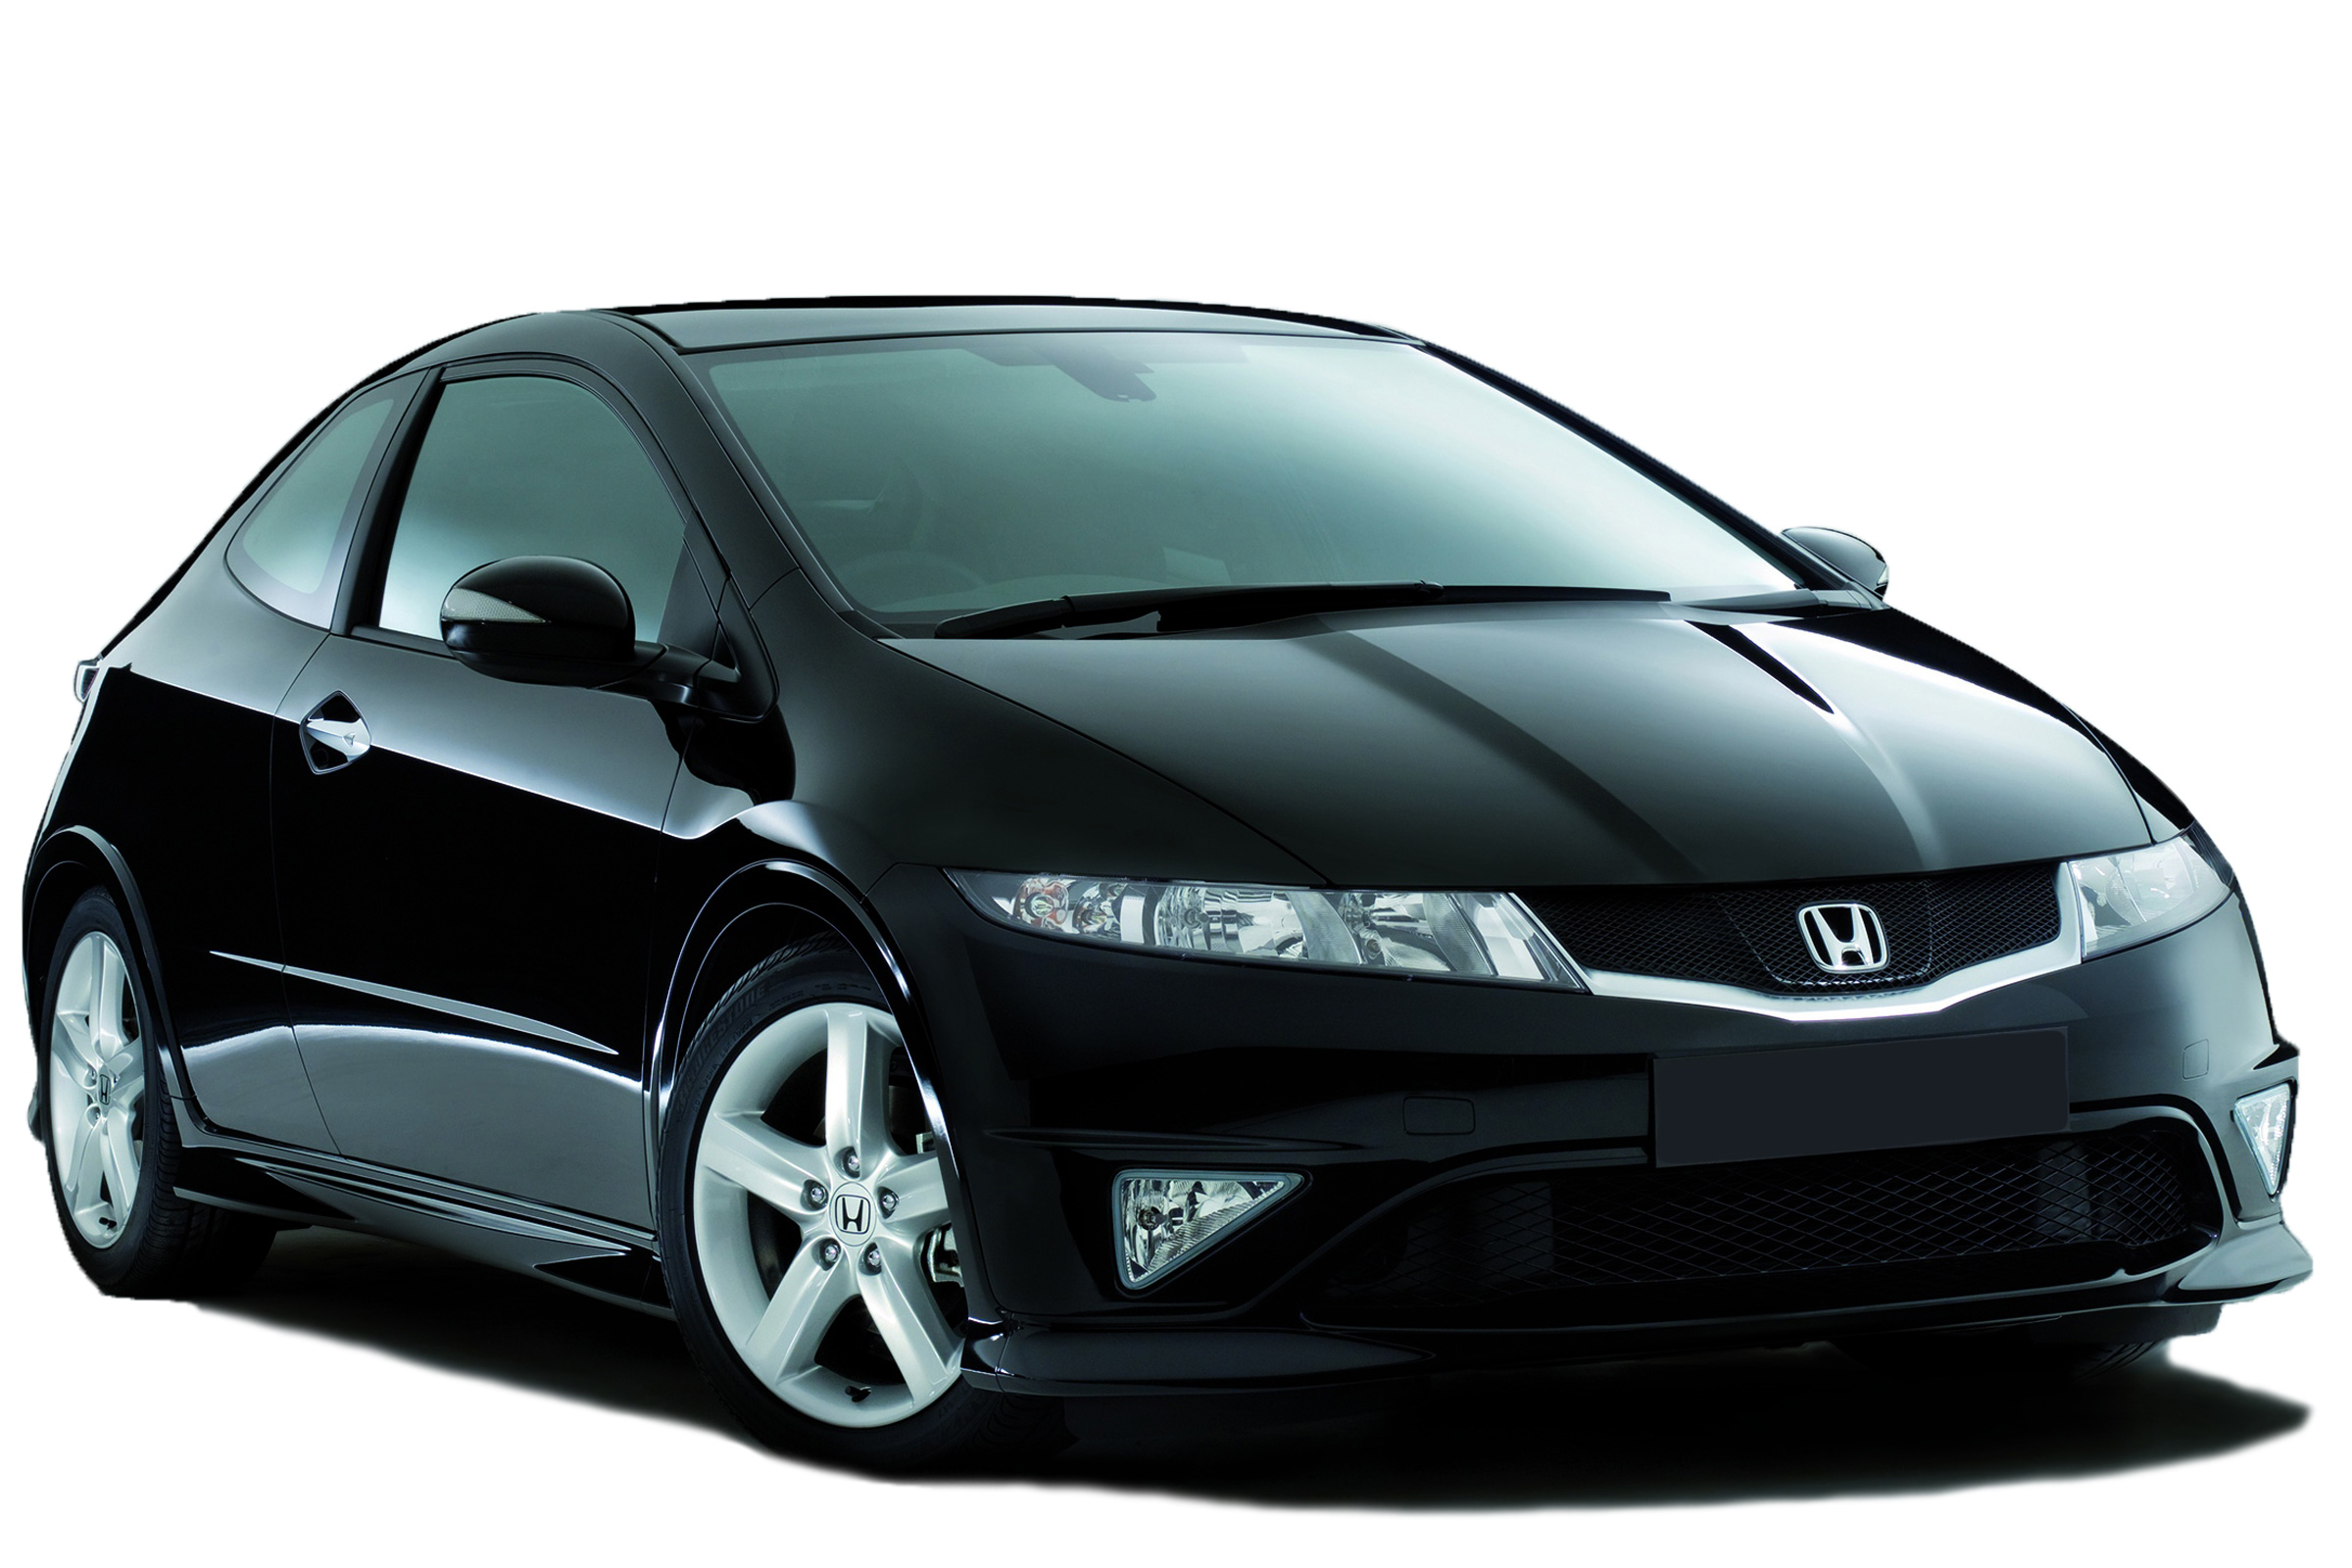 Kelebihan Honda Civic Hatchback 2008 Harga